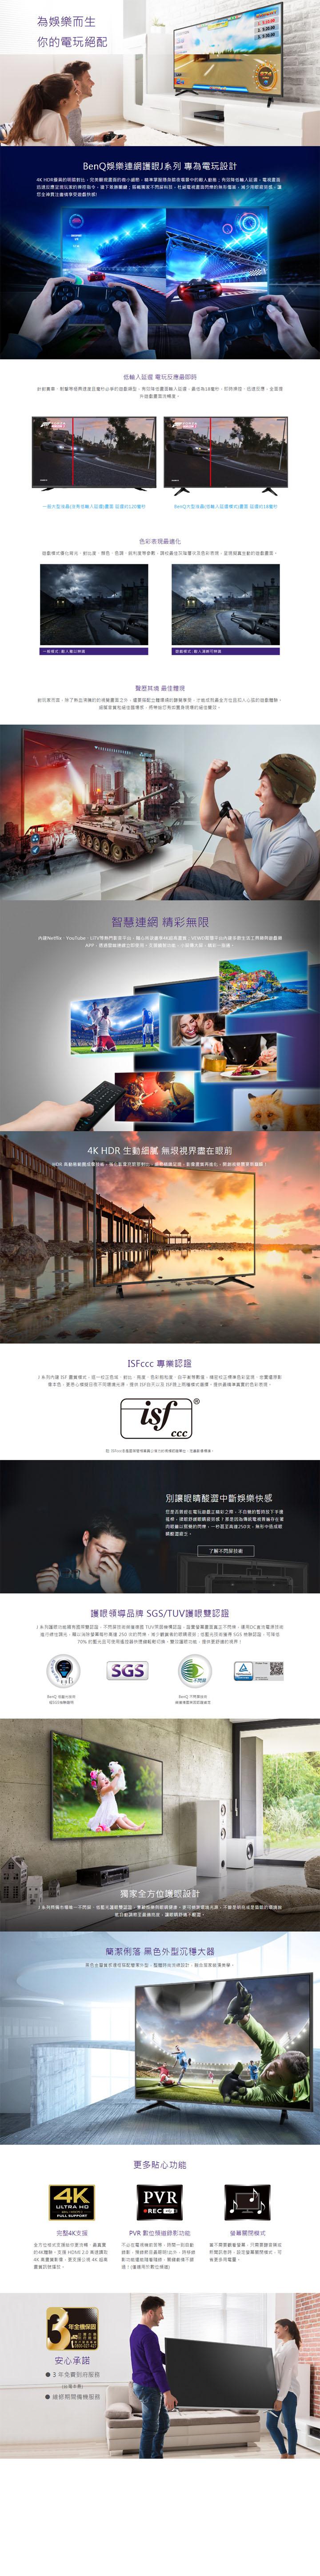 BenQ_J65-700_spec.jpg